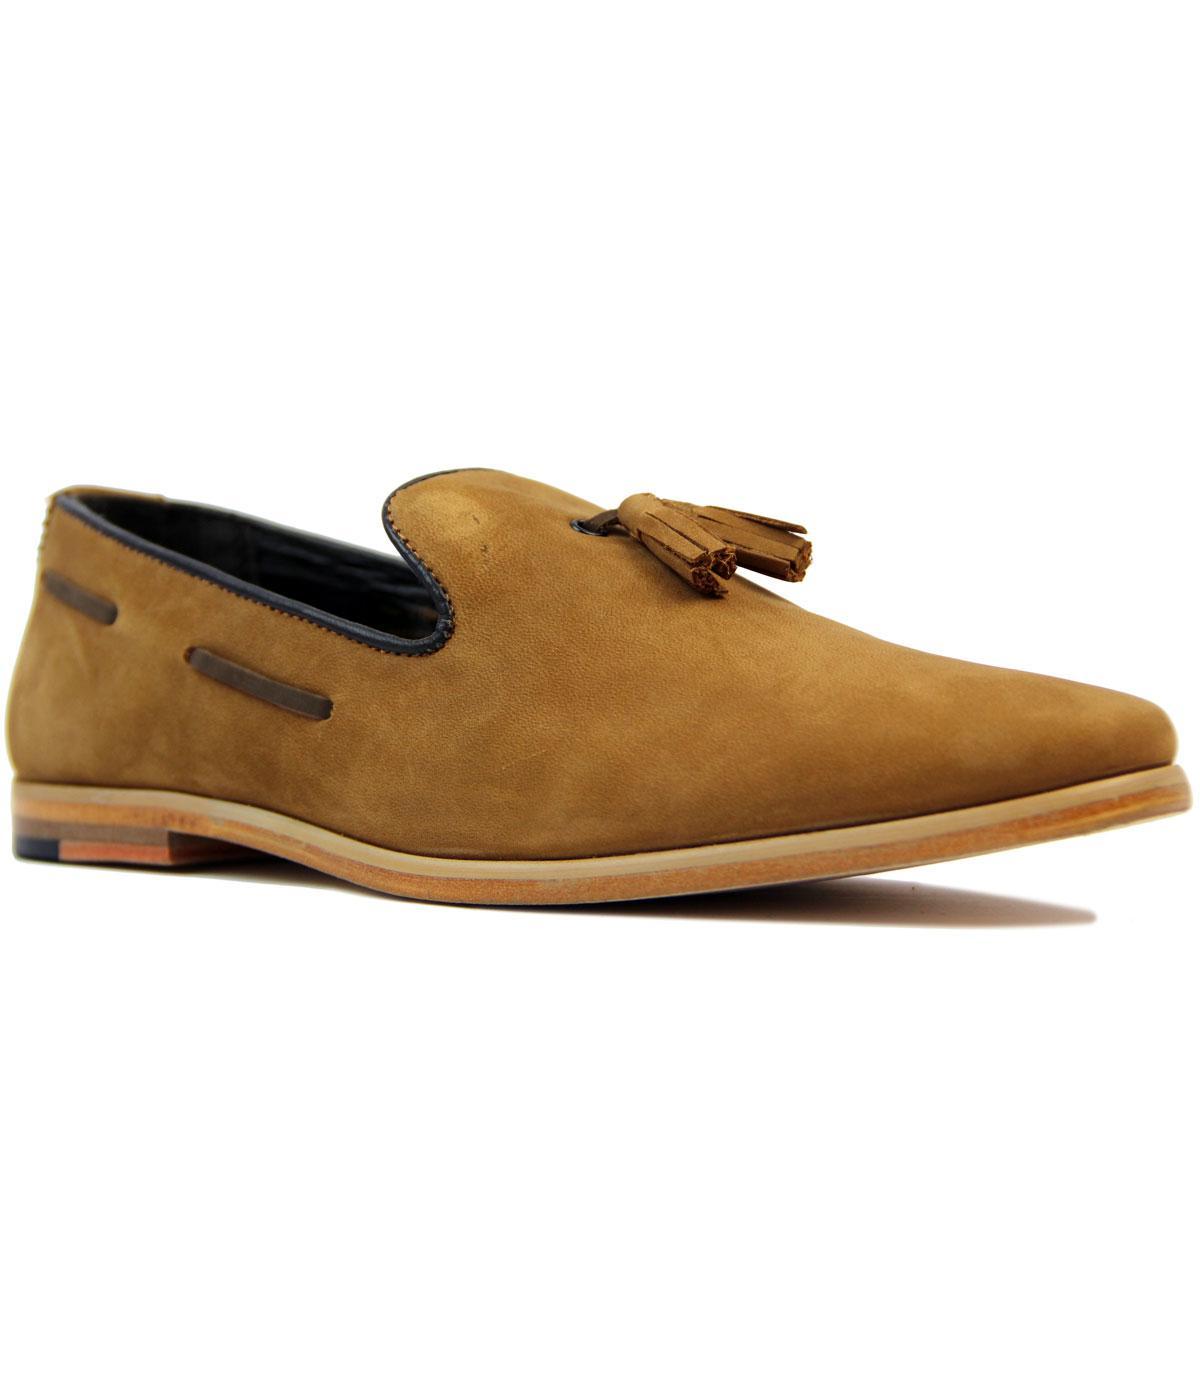 Harry GOODWIN SMITH 60s Mod Nubuck Tassel Loafers